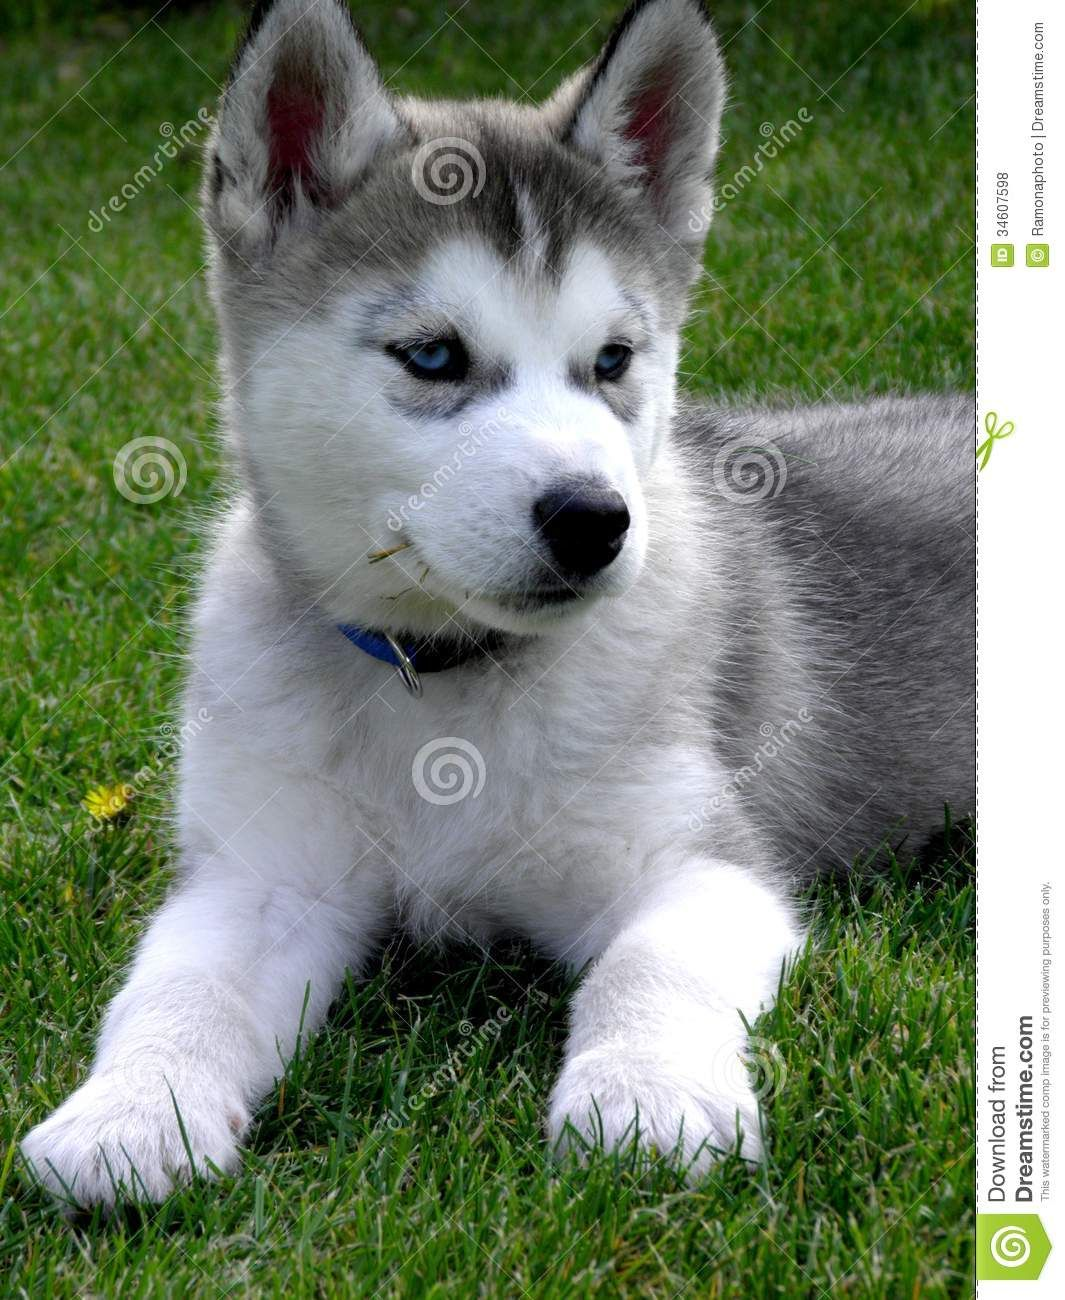 Simple Grey Blue Eye Adorable Dog - a1d0134cbf6a7406b4fc558ed5bf4587  Pic_93629  .jpg